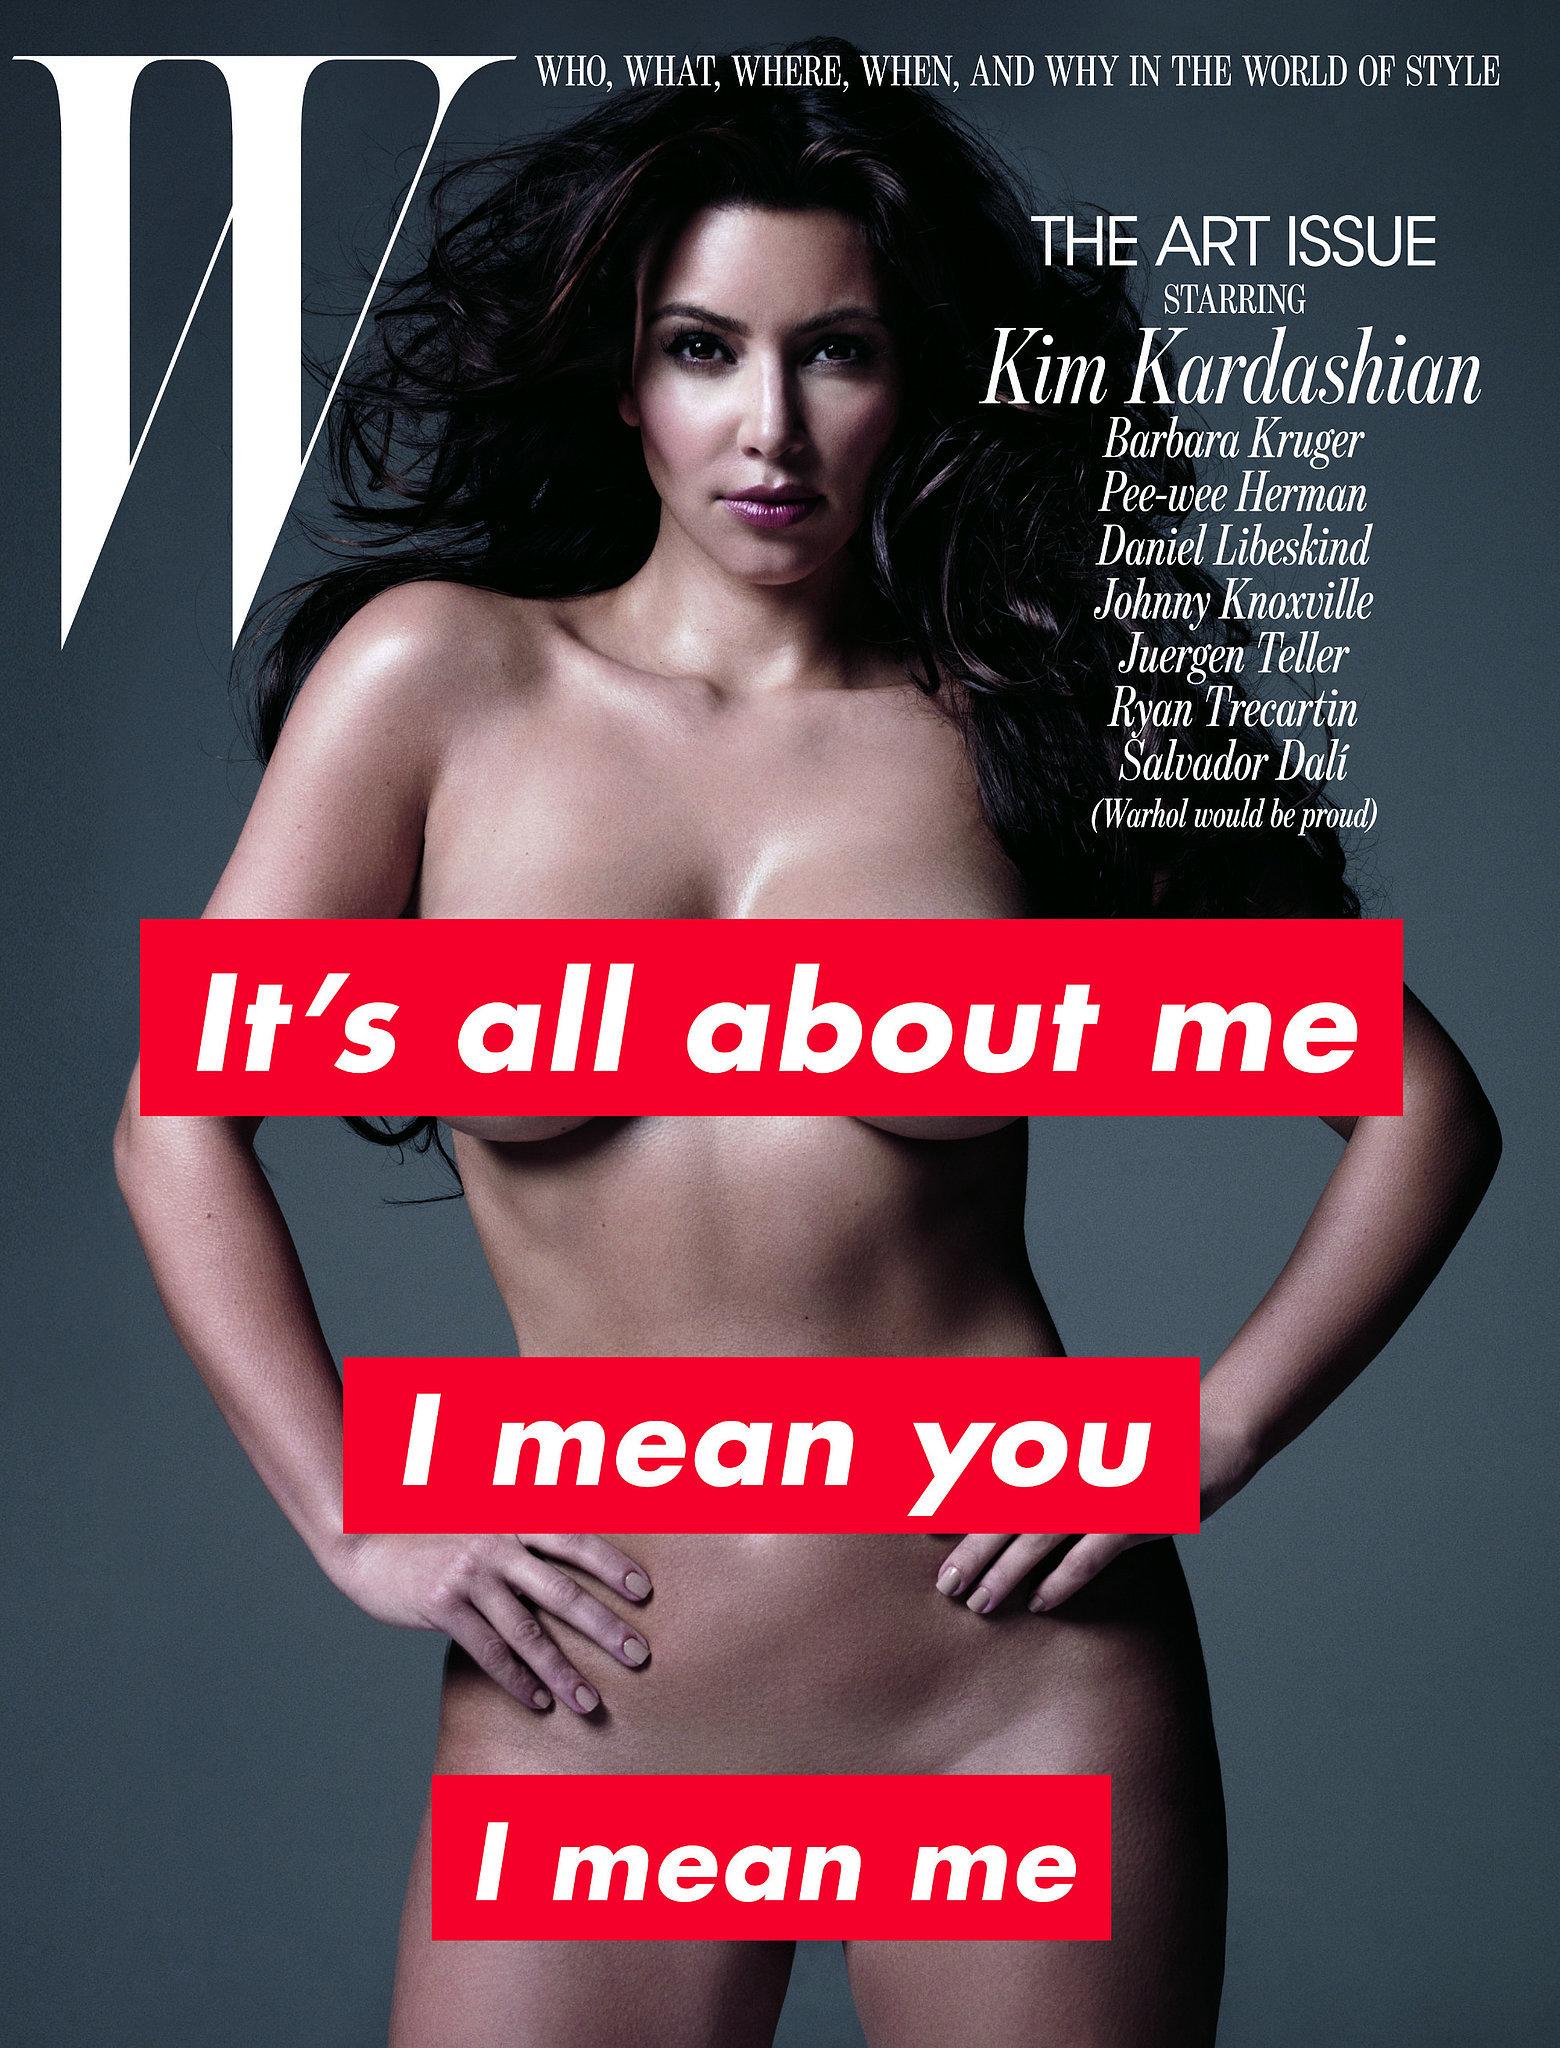 Kim Kardashian For W Magazine, November 2011